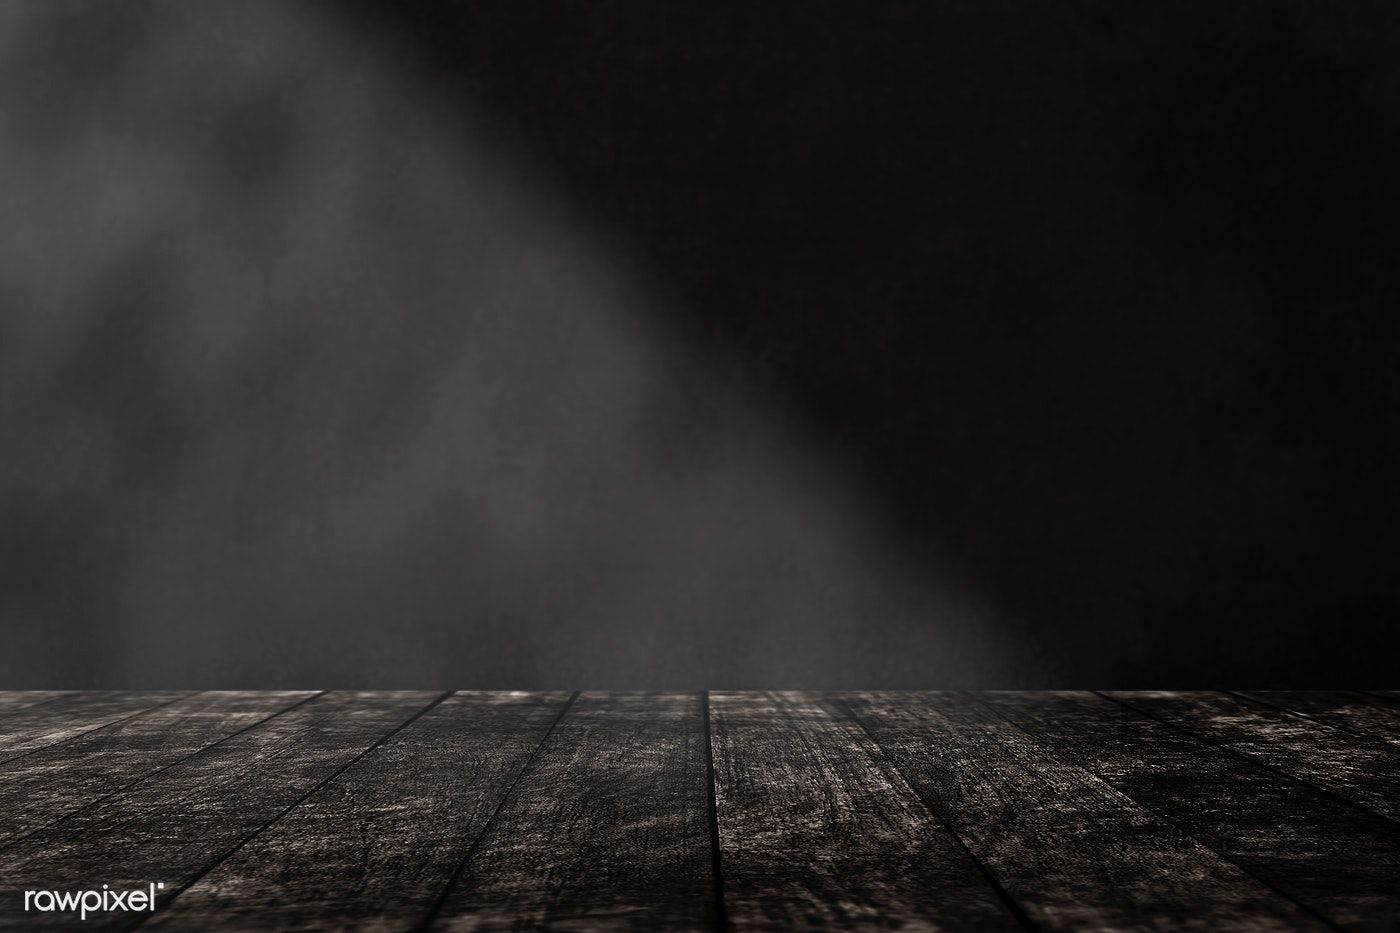 Wooden Floor With Black Wall Product Background Free Image By Rawpixel Com À¹ƒà¸™à¸› 2020 À¸¨ À¸¥à¸›à¸°